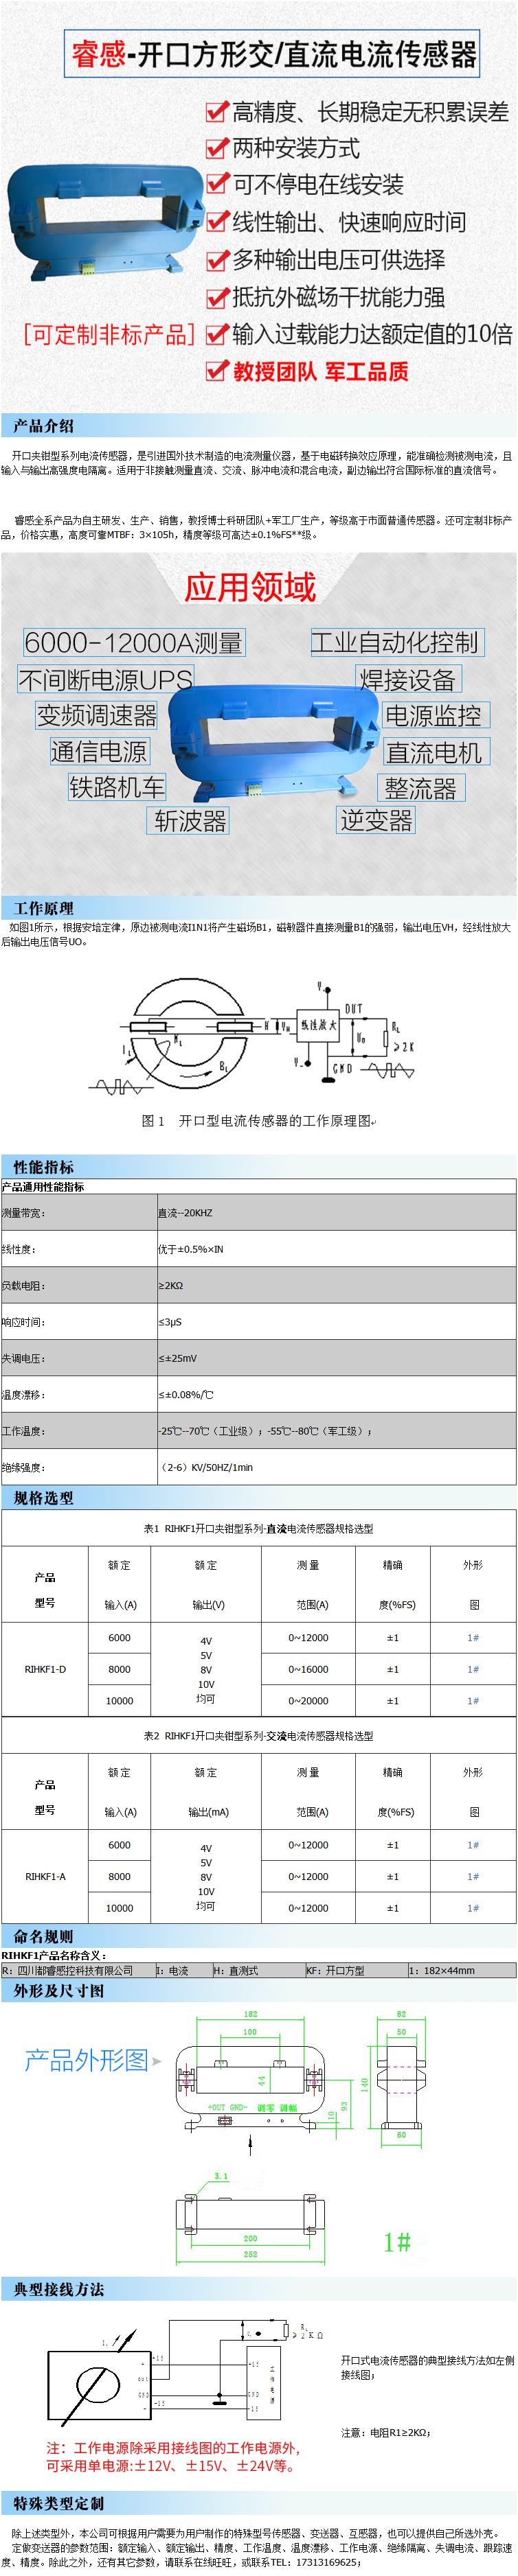 12000A大电流传感器霍尔交流直流开口电流检测输出10V_20mA军工级-淘宝网副本.png